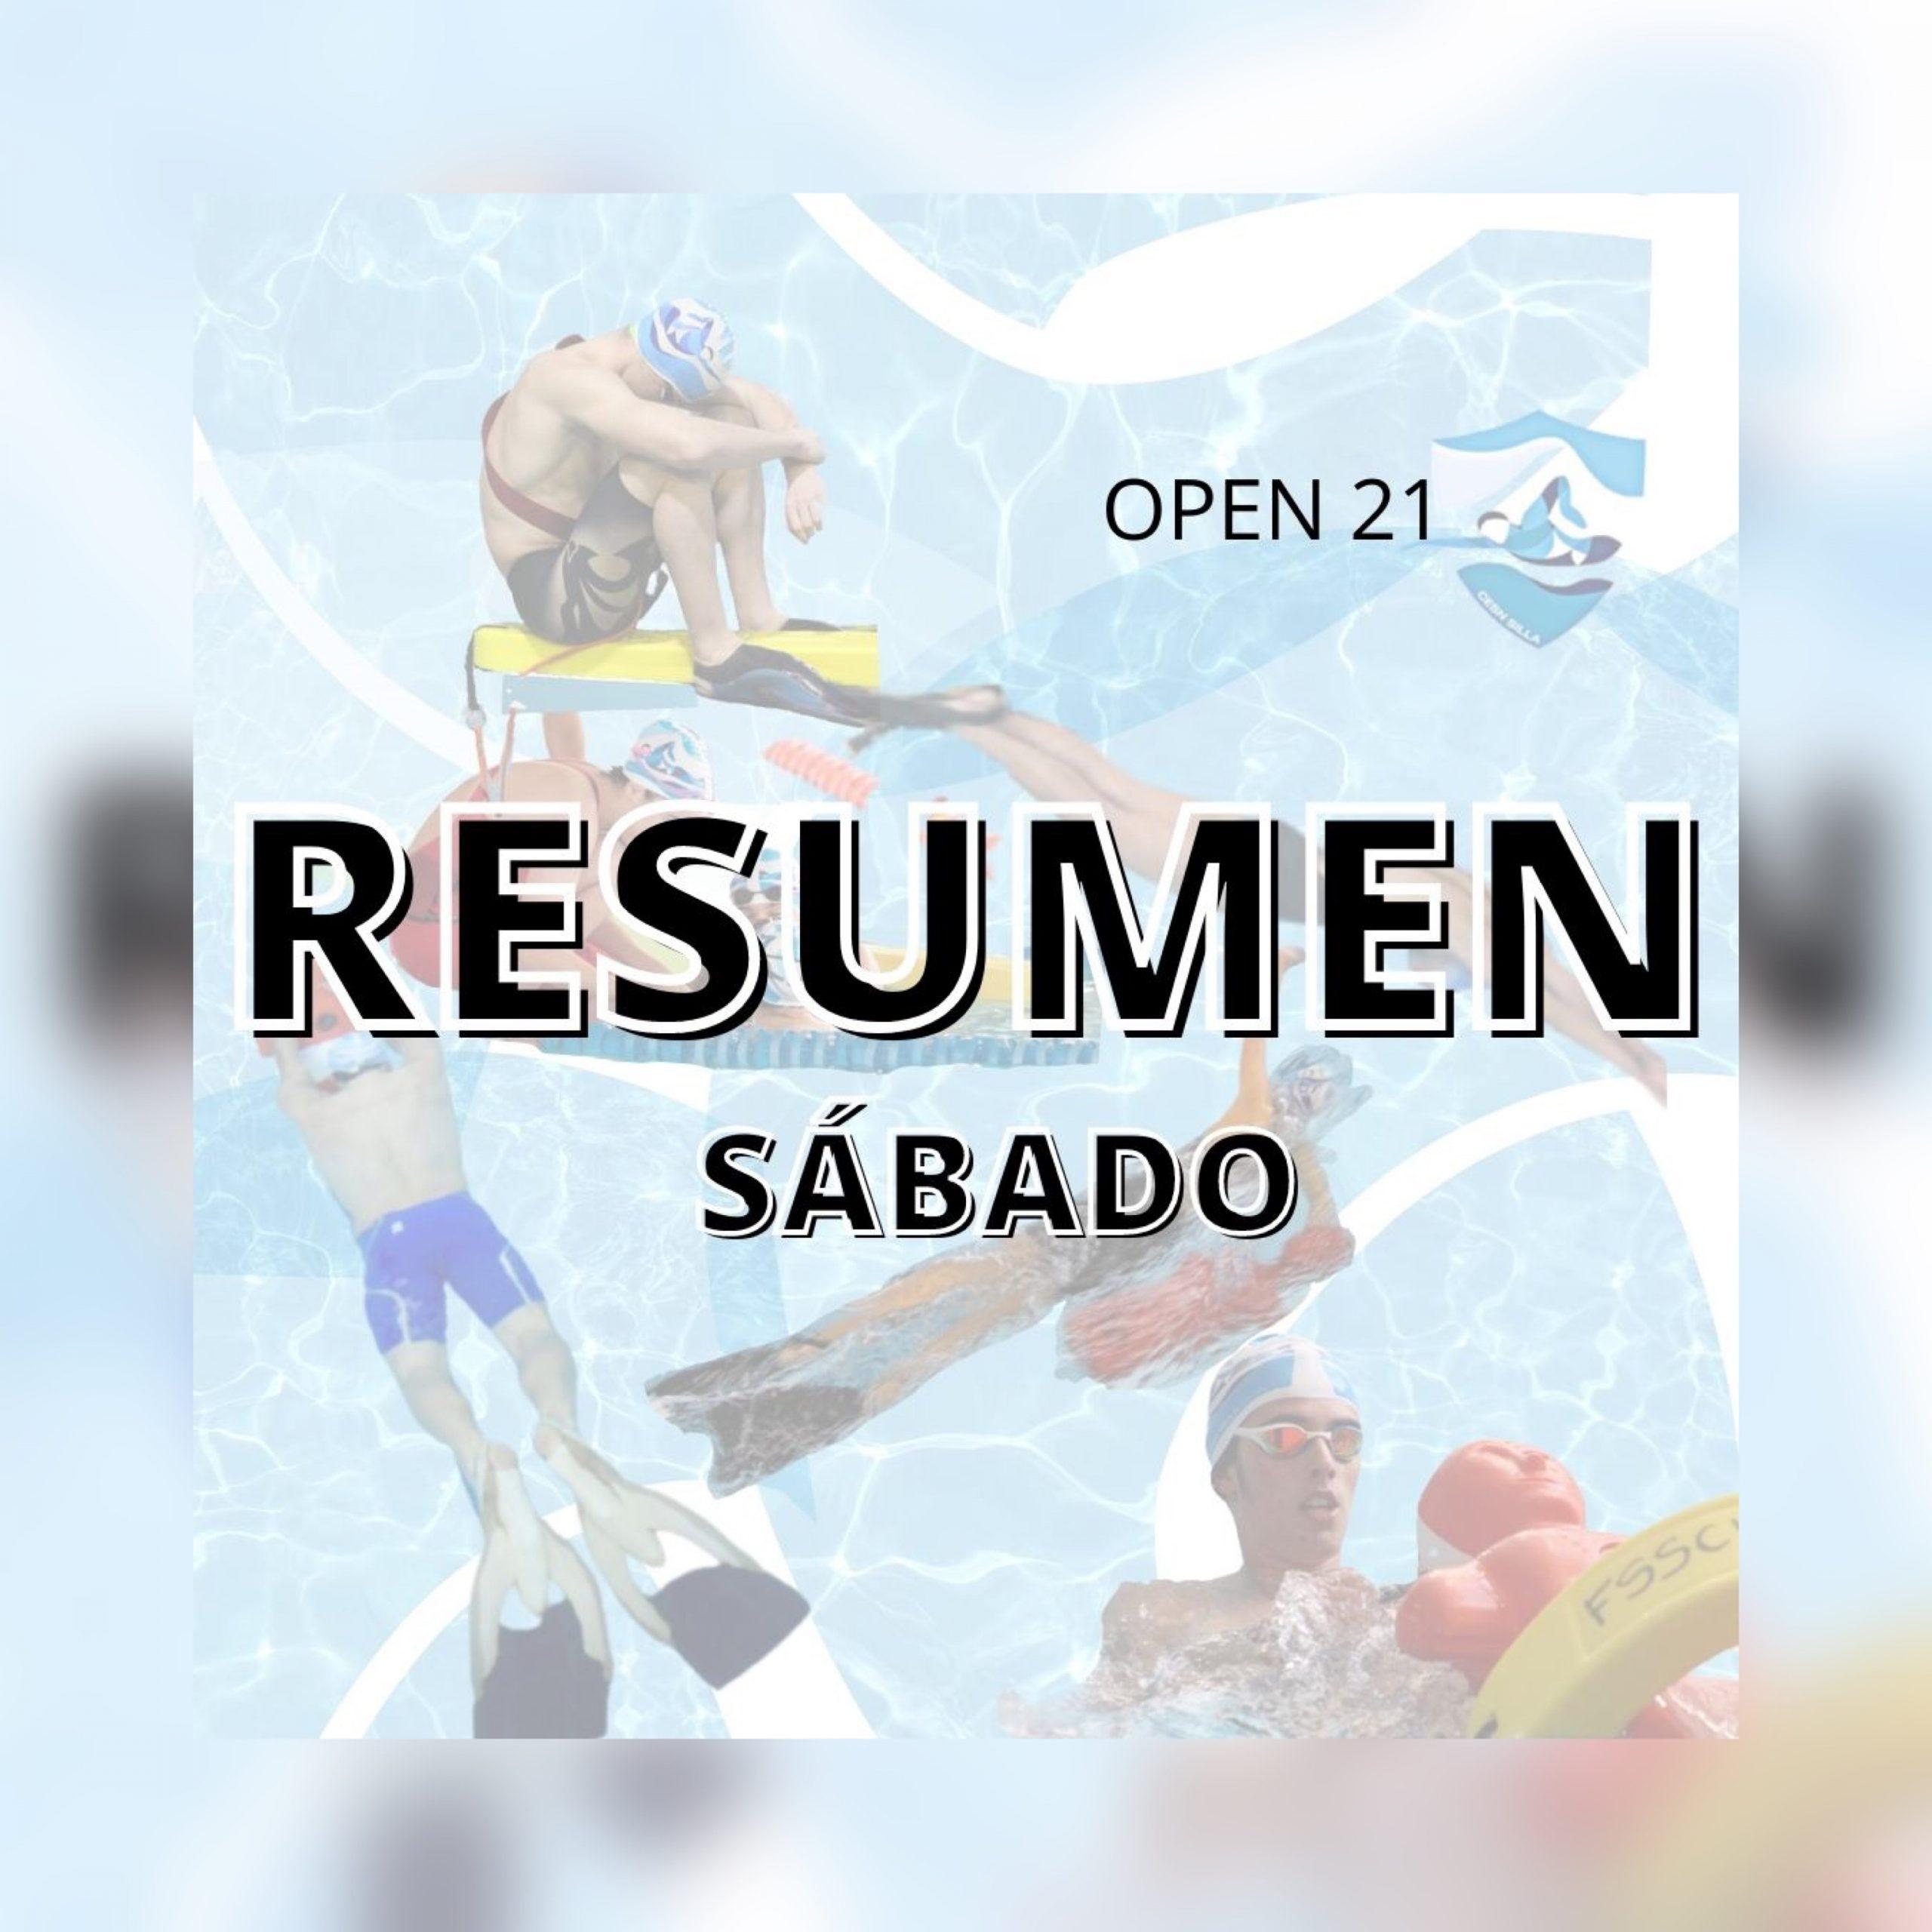 RESUMEN SÁBADO OPEN